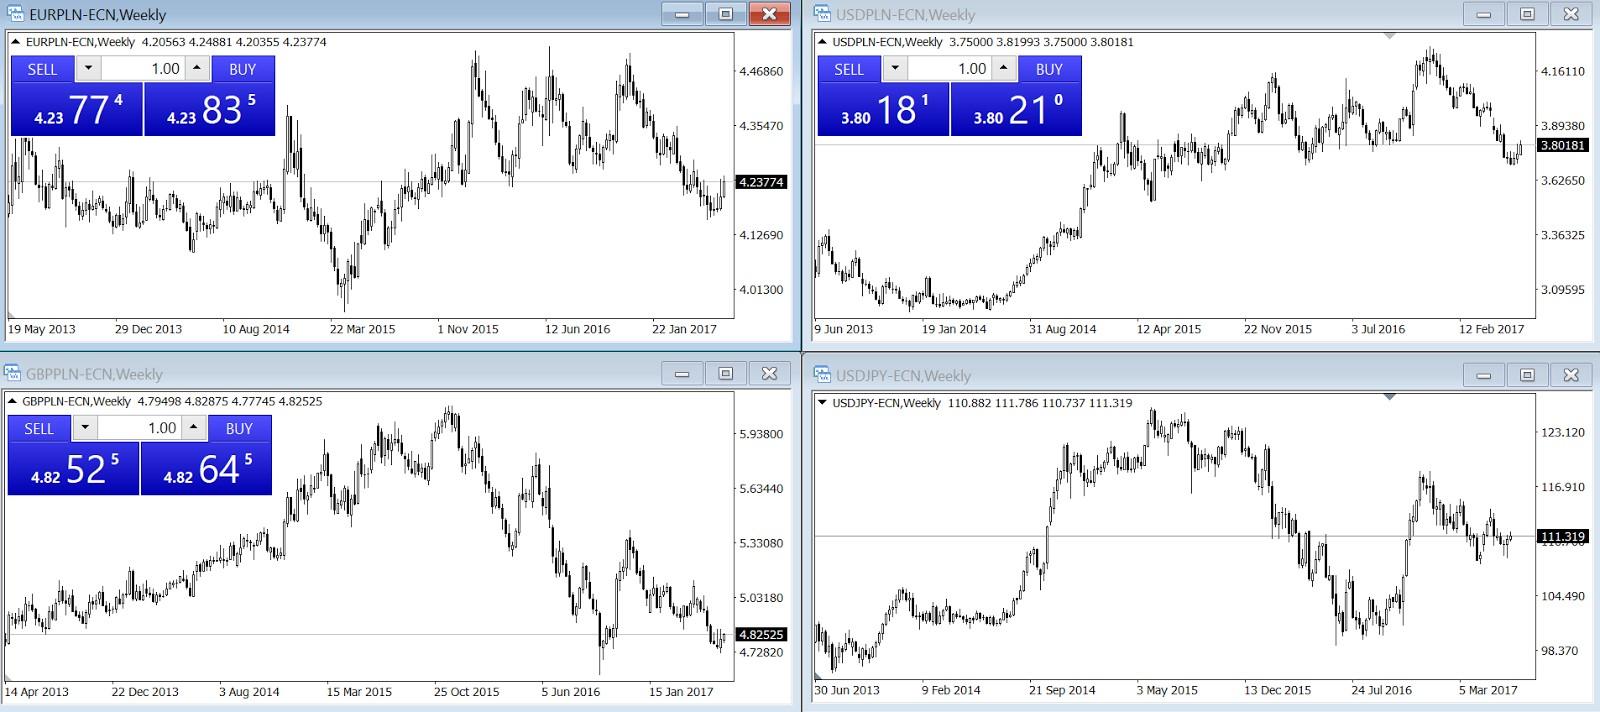 Trading Binary Options - mi ez? A legjobb stratégia kereskedelmi